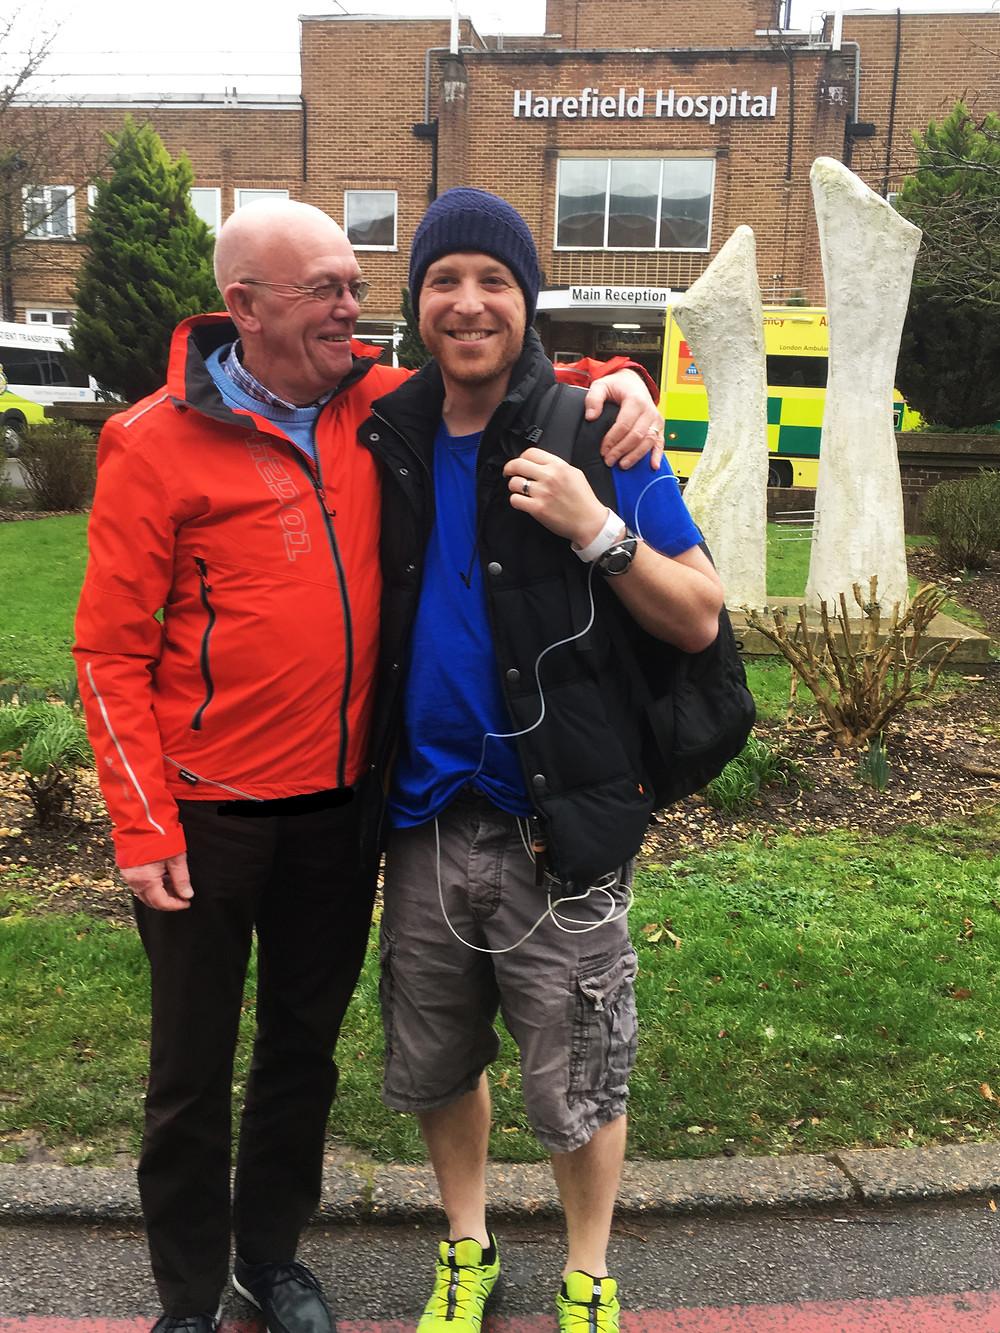 Nick & Bob at Harefield Hospital